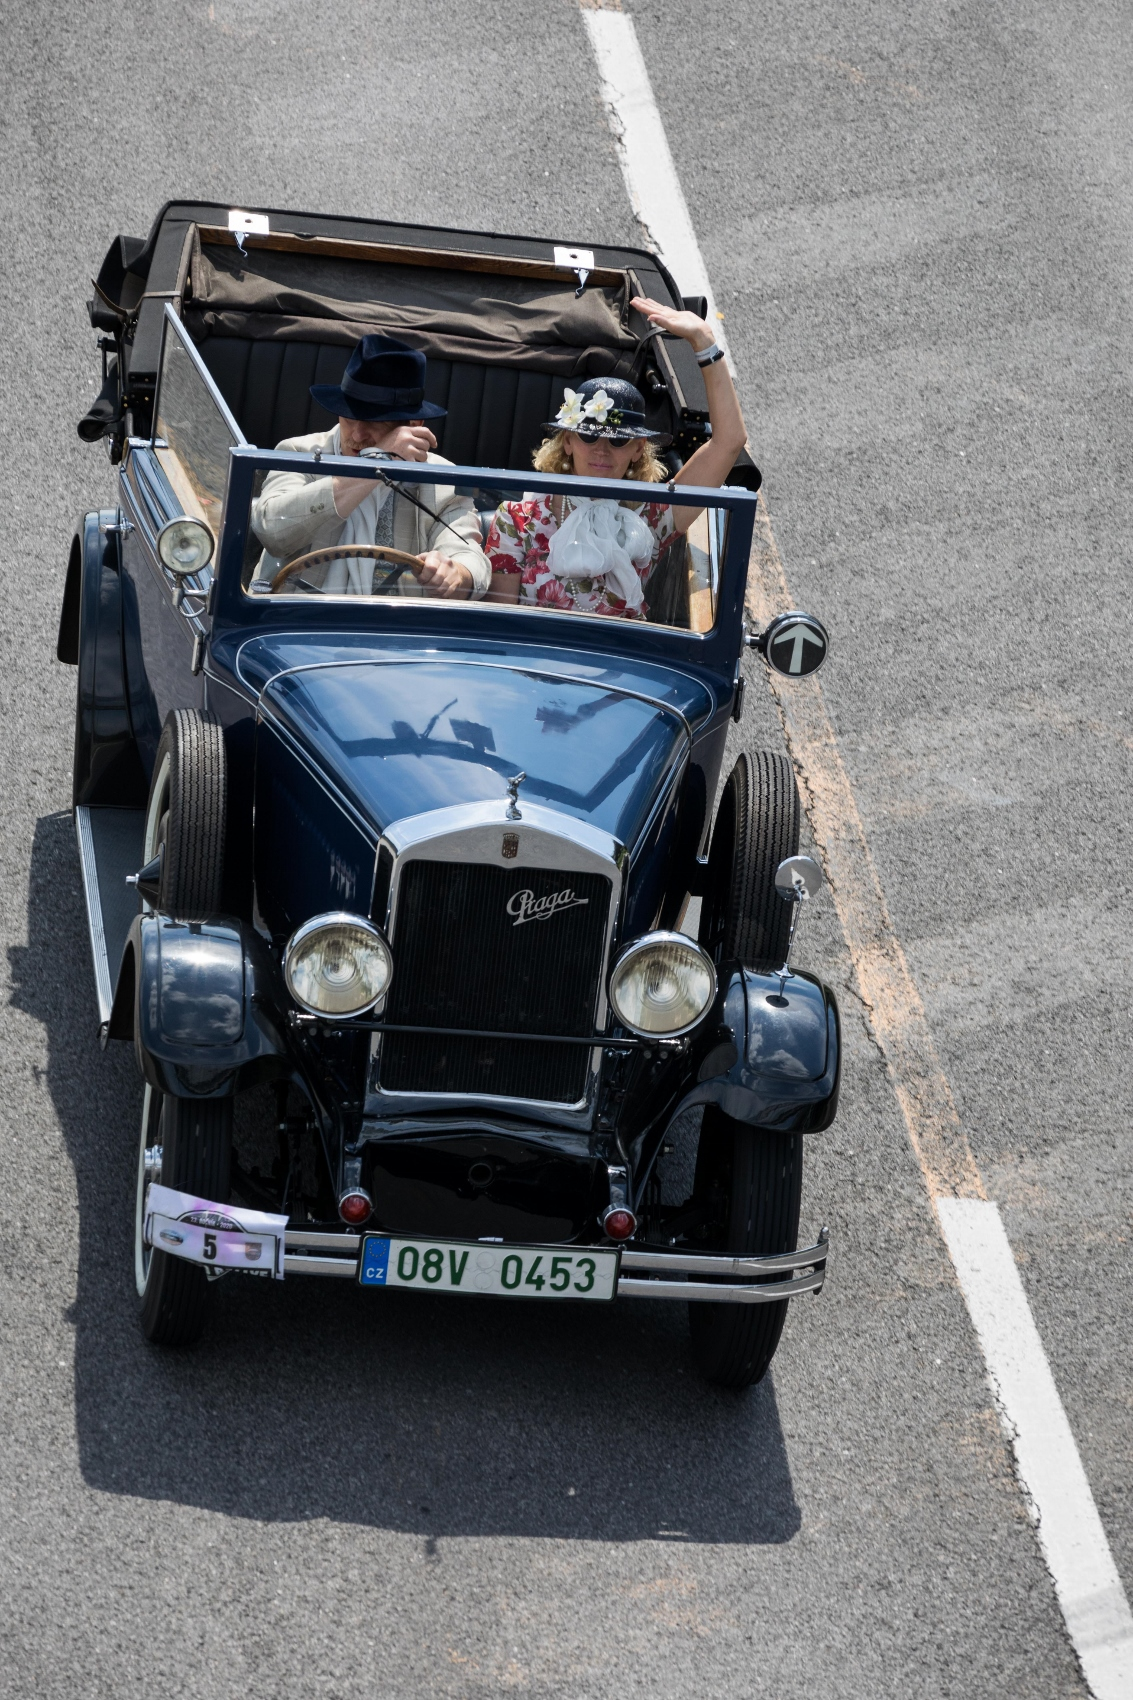 Pozrite si galériu z podujatia Beskyd Rallye – memoriál Ladislava Dlhopolčeka 2020 2QtJDZeh2U turzov